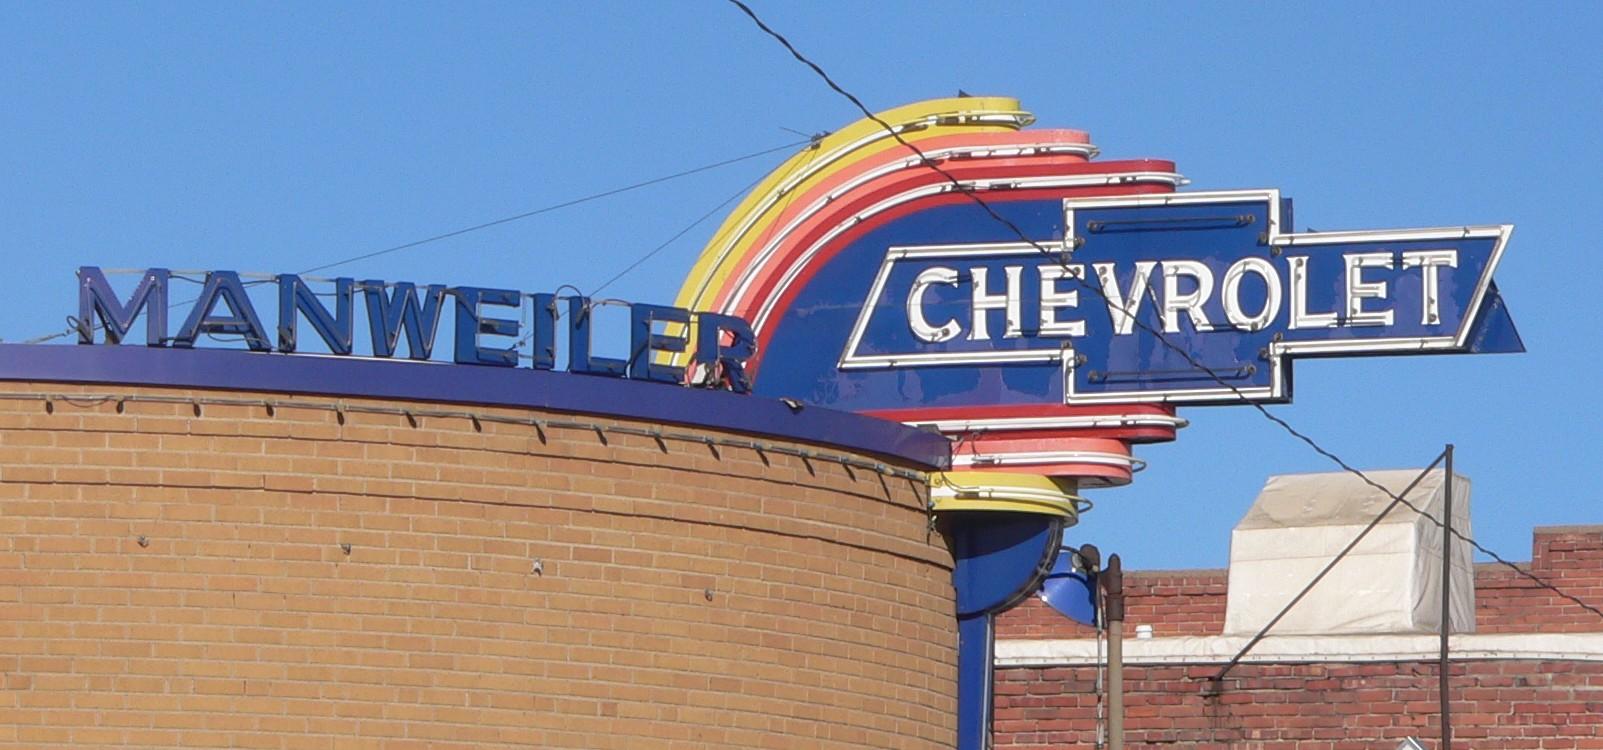 File Manweiler Chevrolet Sign 1 Jpg Wikimedia Commons